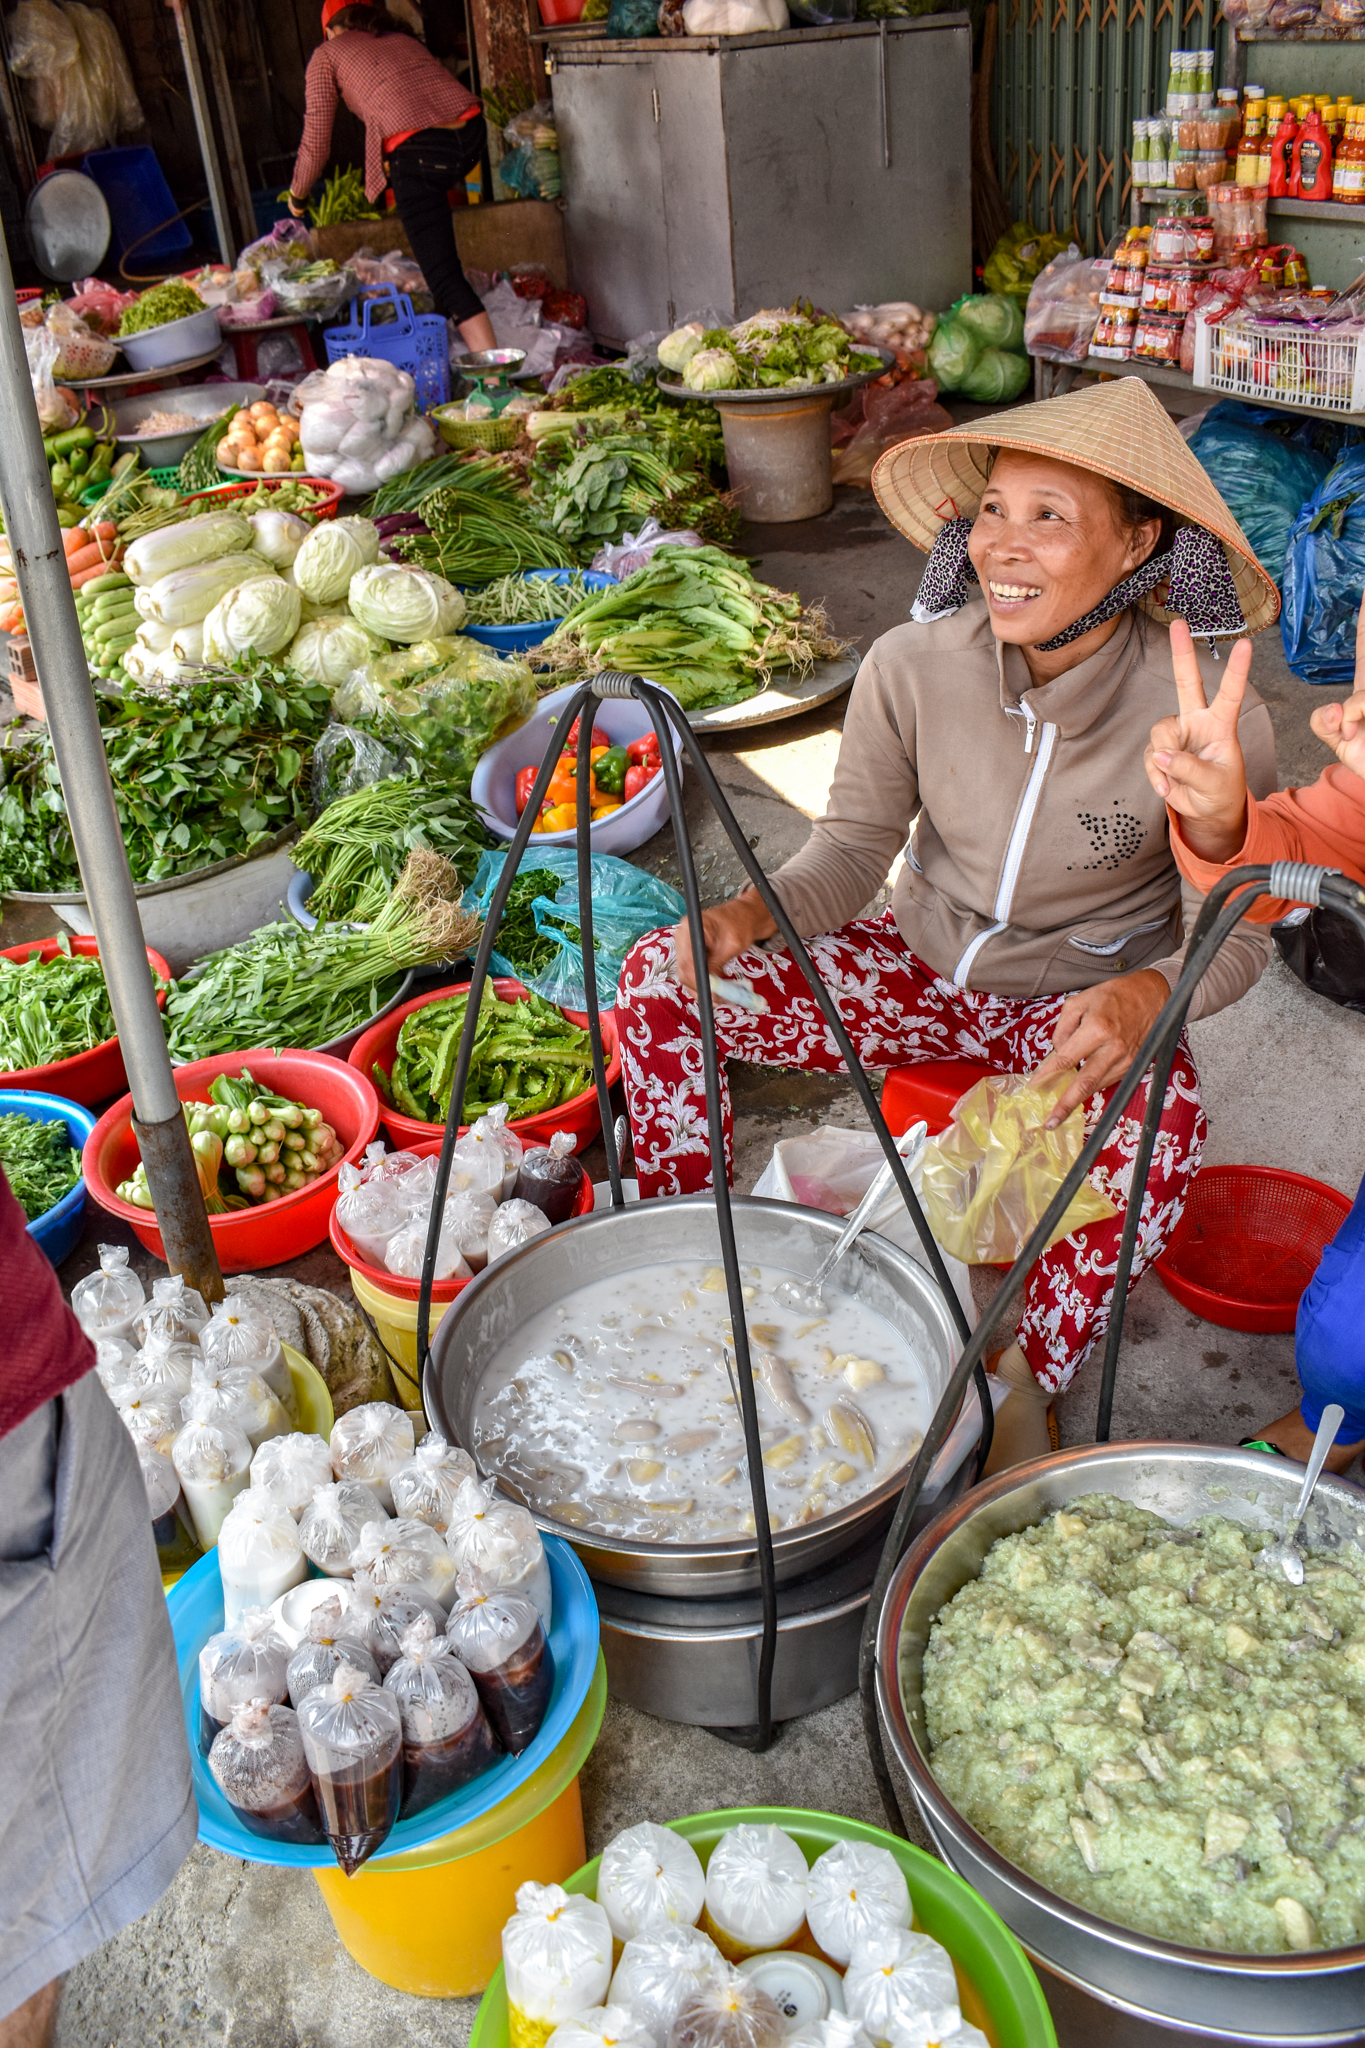 Uprooted-Traveler-Ho-Chi-Minh-market-vegan-vespa-adventures-mekong-delta.jpg